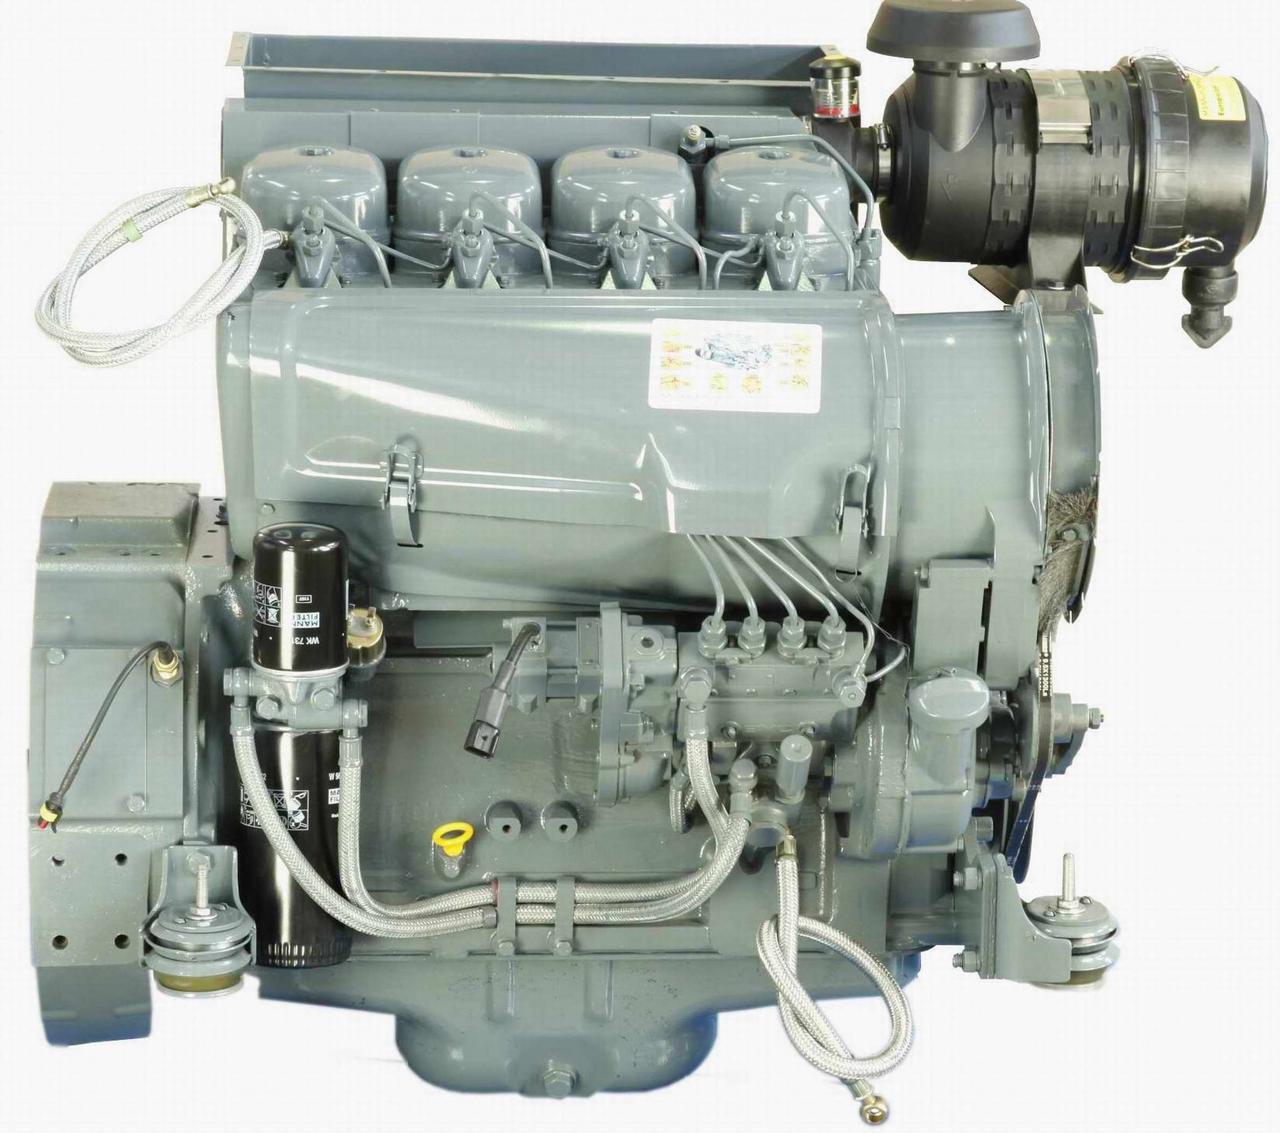 Двигатель Deutz BF12L513, Deutz BF12L513C, Deutz BV 12 M 350, Deutz BV12M628, Deutz BV12M628, Deutz BV6M628